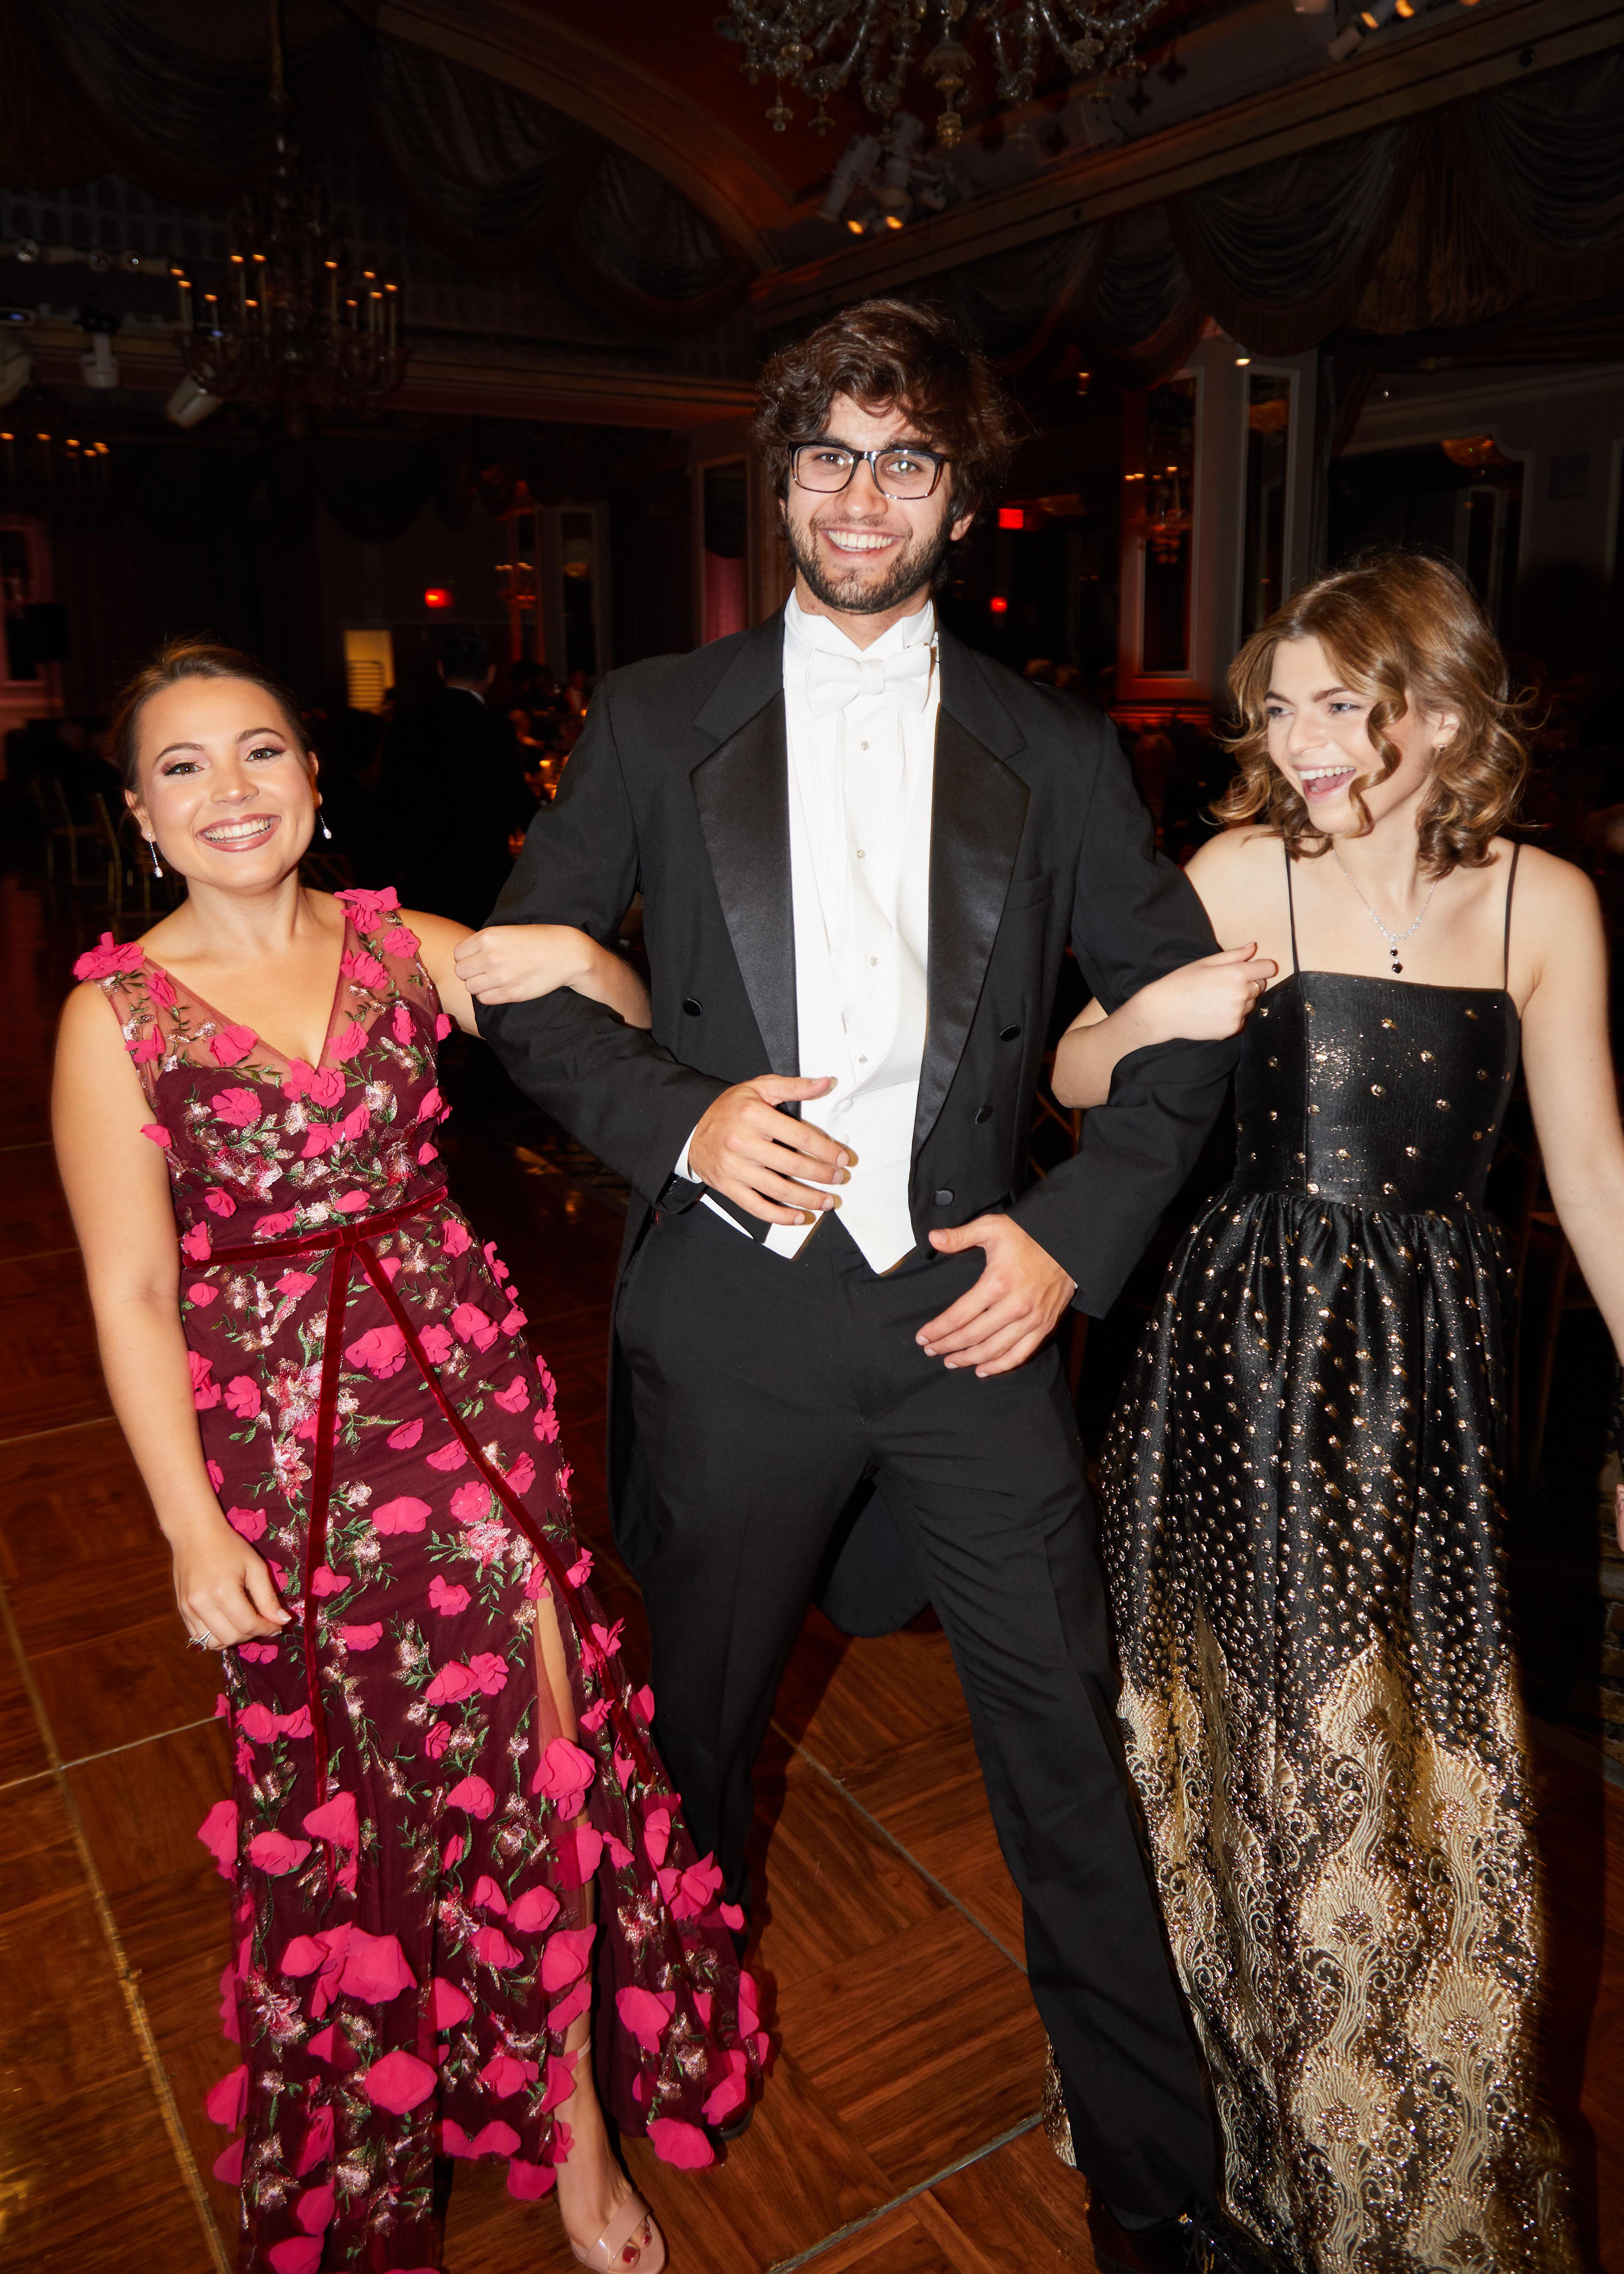 Logan Welborn, Tristan Jamidar and Claire Ryland